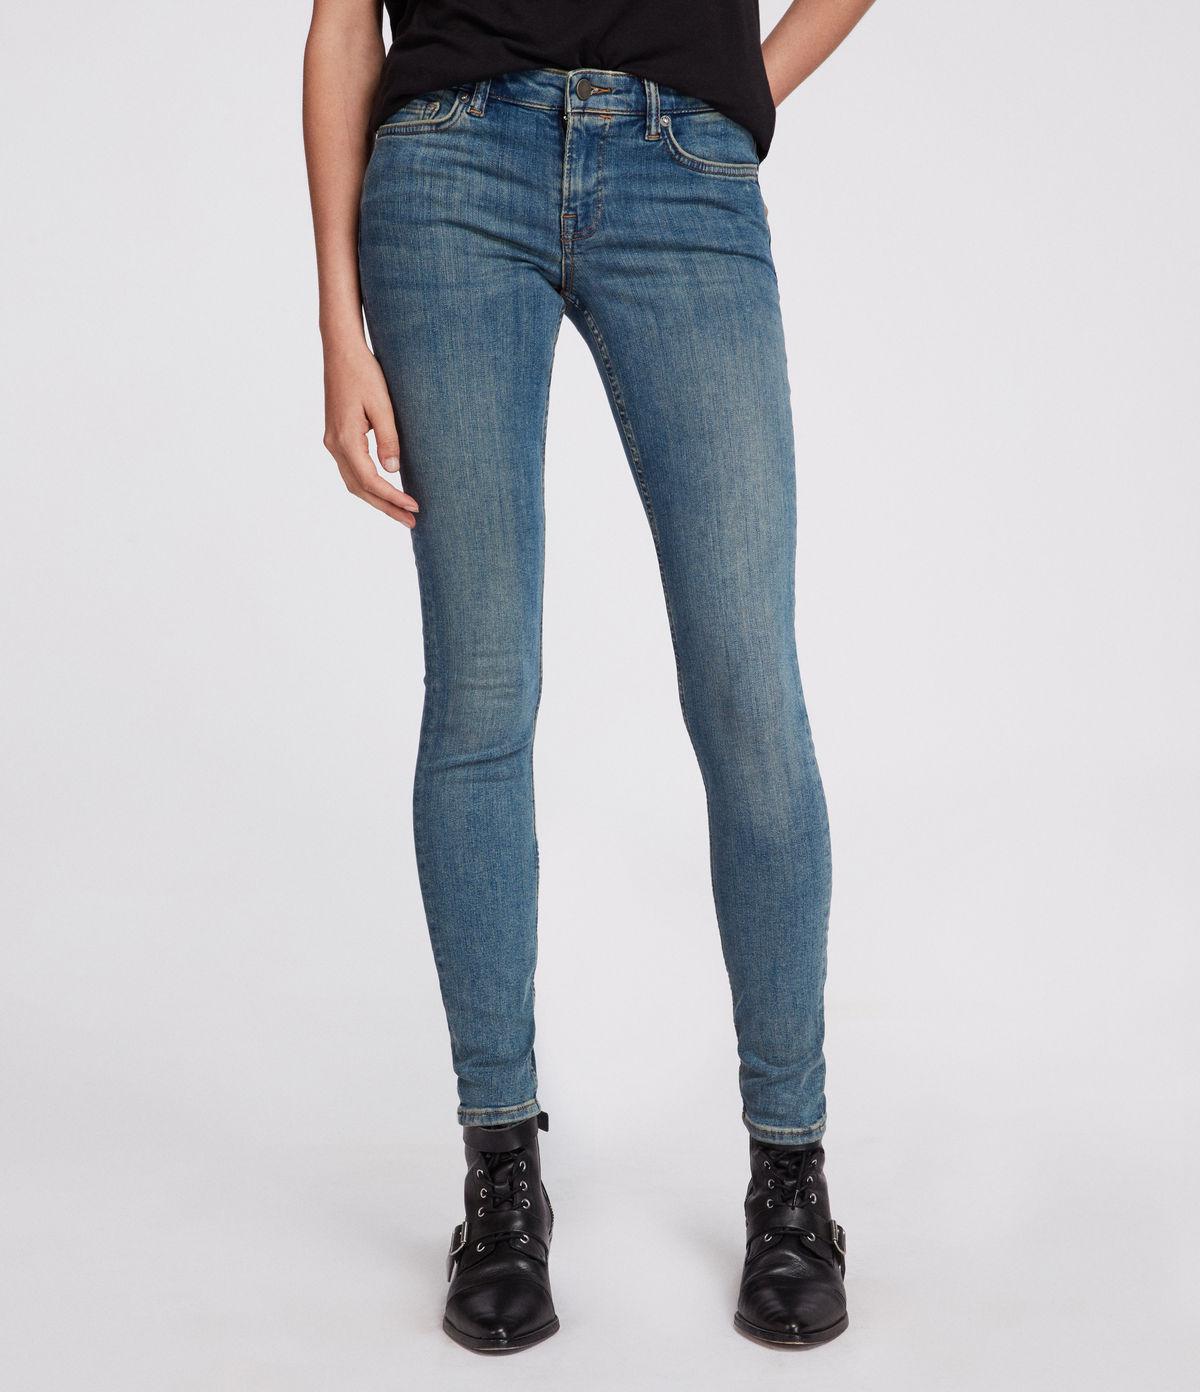 mast-jeans